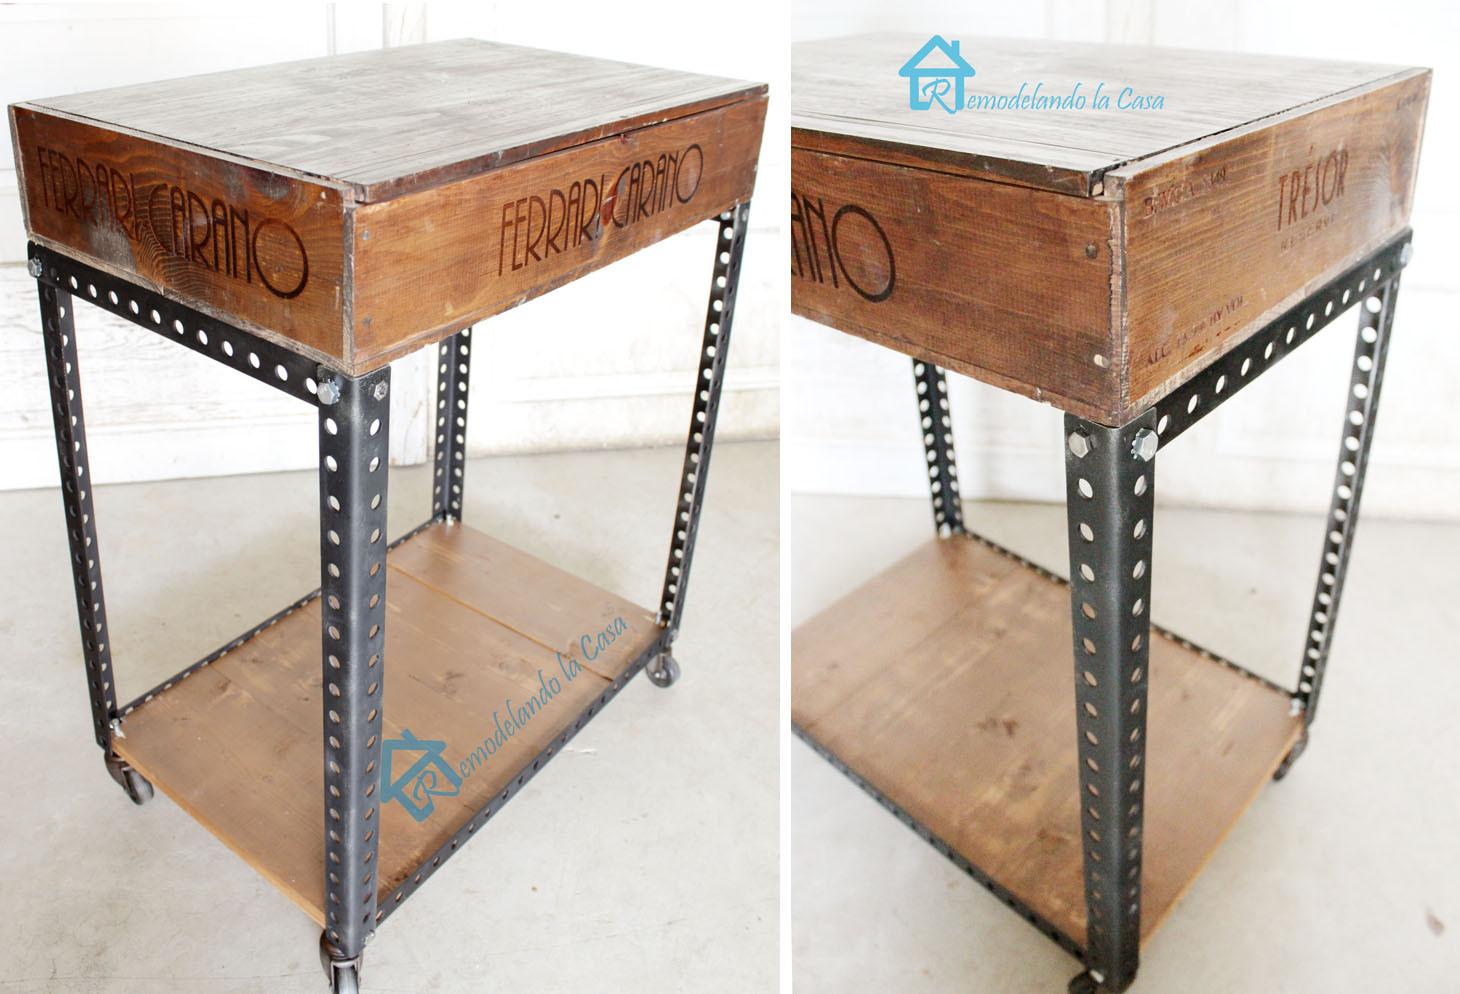 Best ideas about DIY Industrial Table . Save or Pin DIY Industrial Side Table Remodelando la Casa Now.